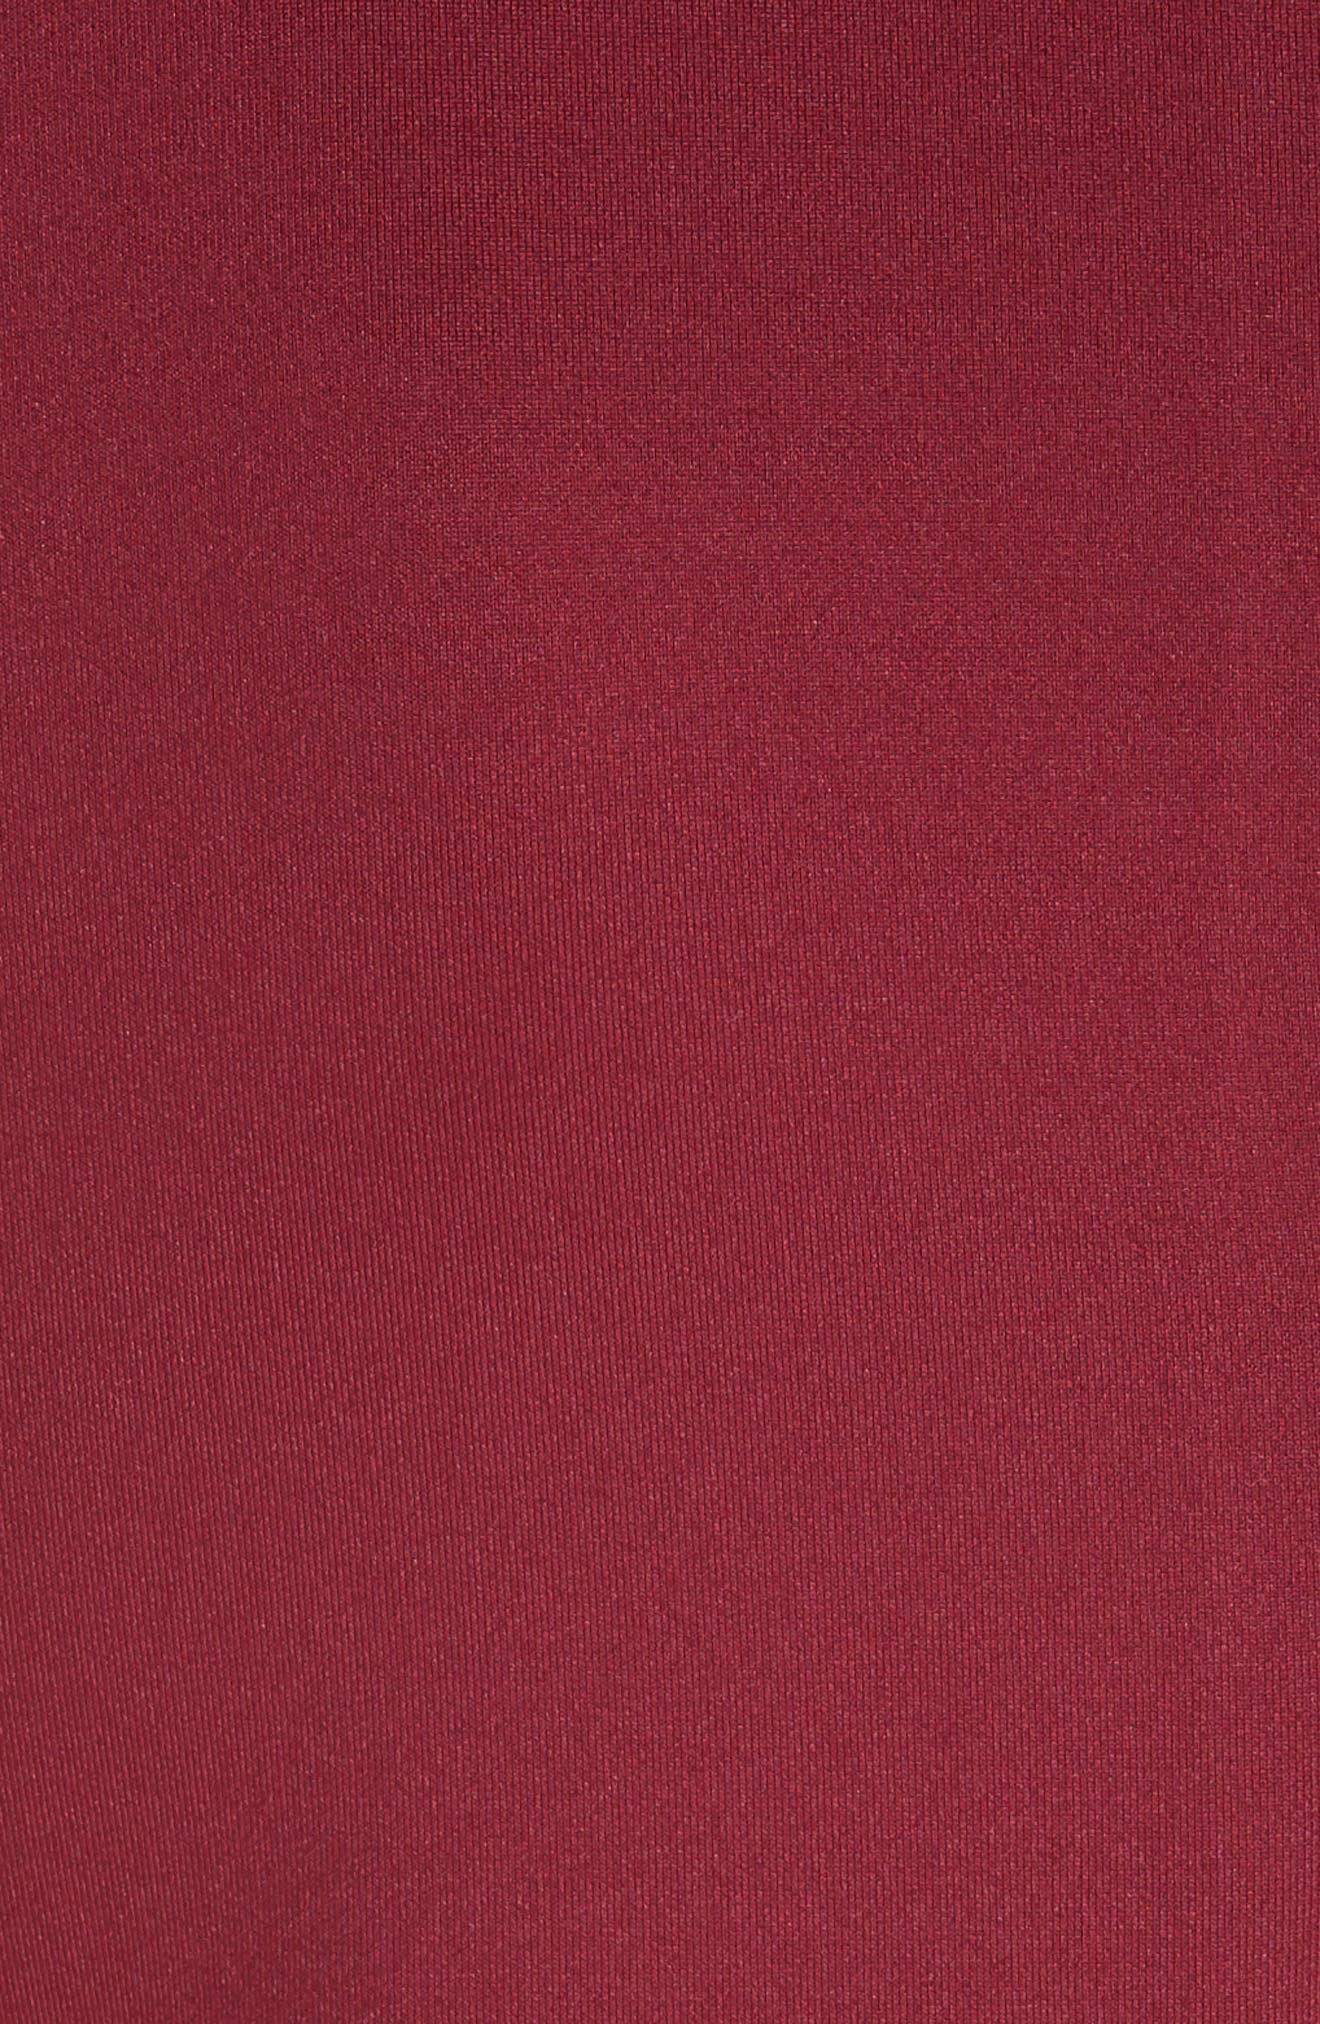 TED BAKER LONDON, Jasmint Scallop Overlay Dress, Alternate thumbnail 6, color, MAROON